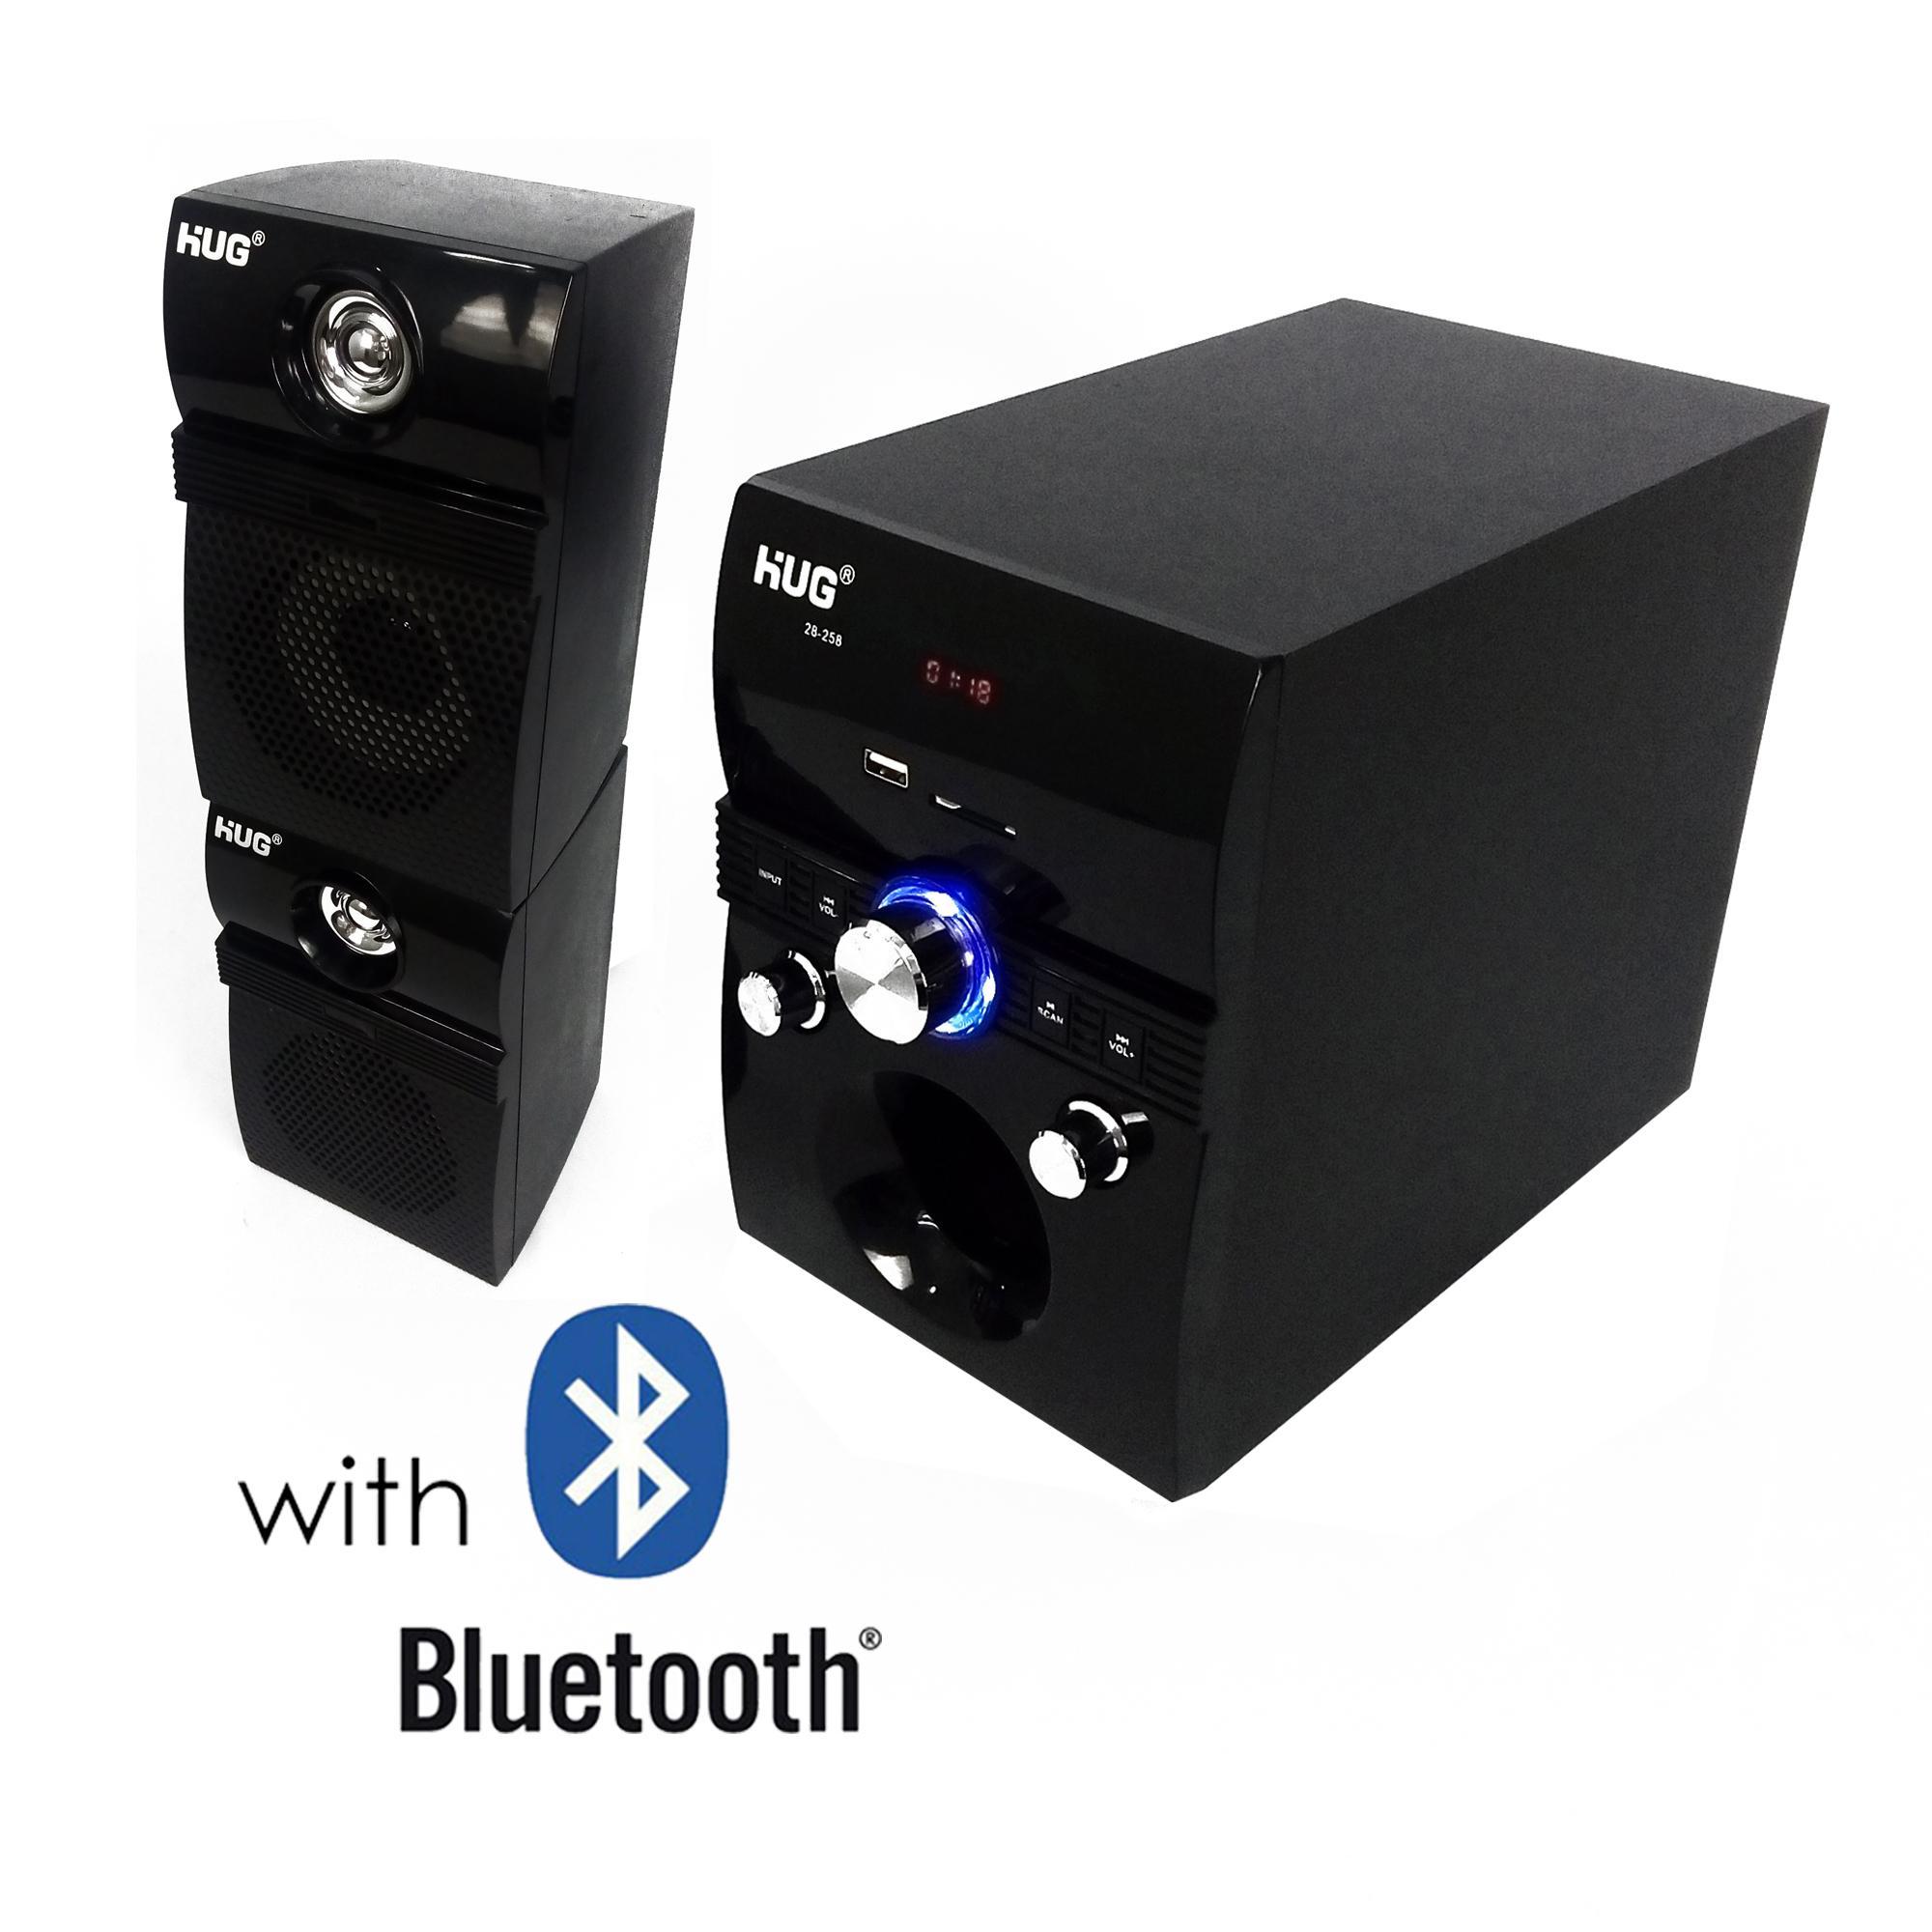 HUG H28-258 Subwoofer Speaker w/ USB slot, built-in FM Radio